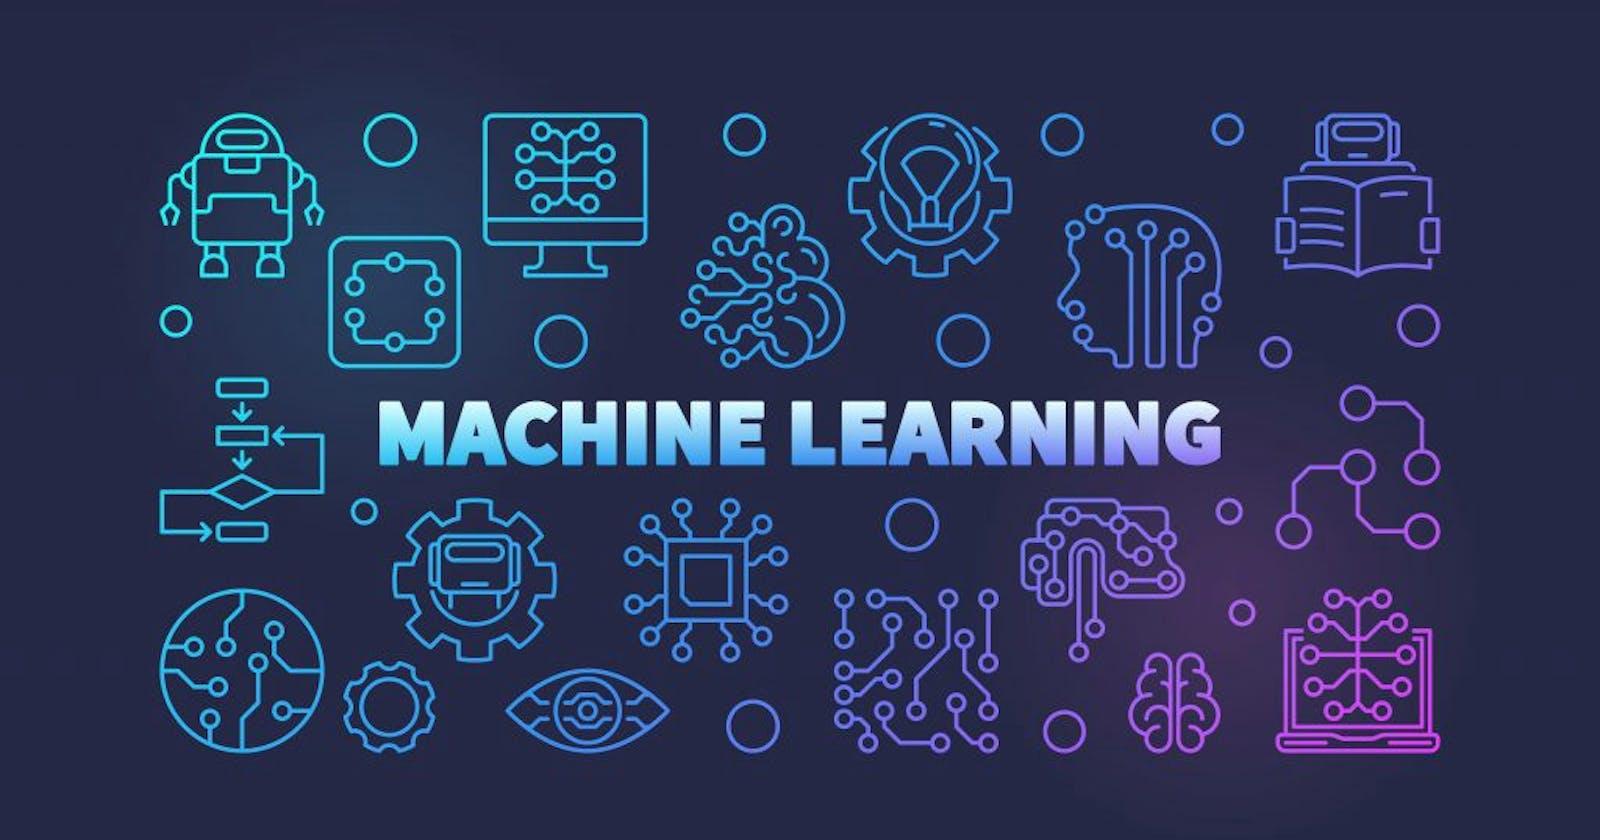 #1. a Machine Learning Journey - Kick-off